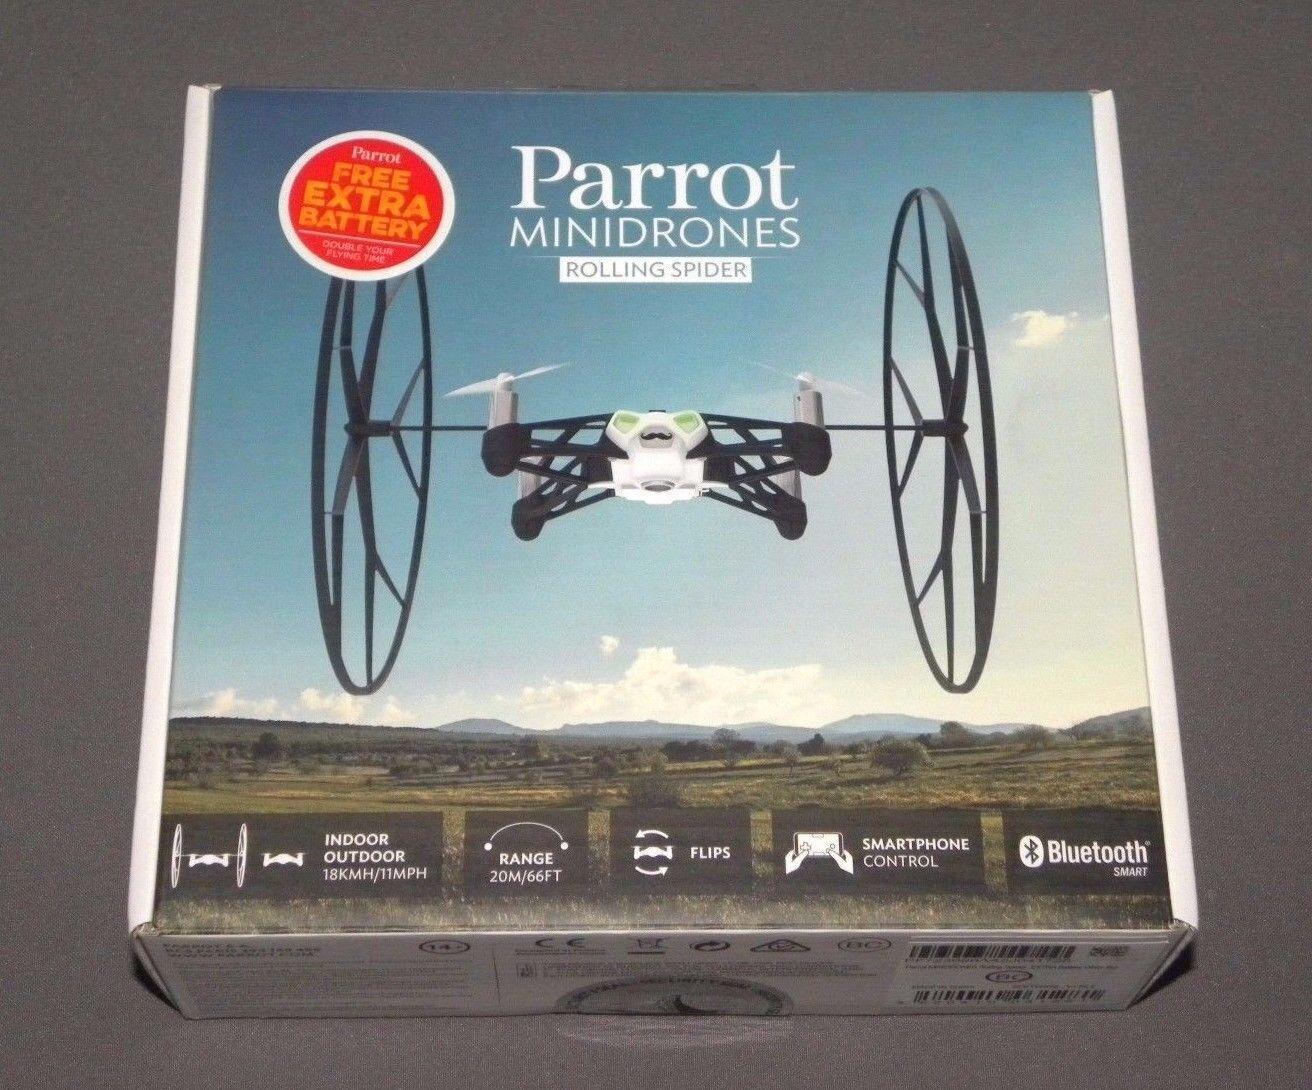 Parrot Minidrones Rollen Spinne Weiß Drone Rc Fahrzeug mit Kamera, Extra Akku